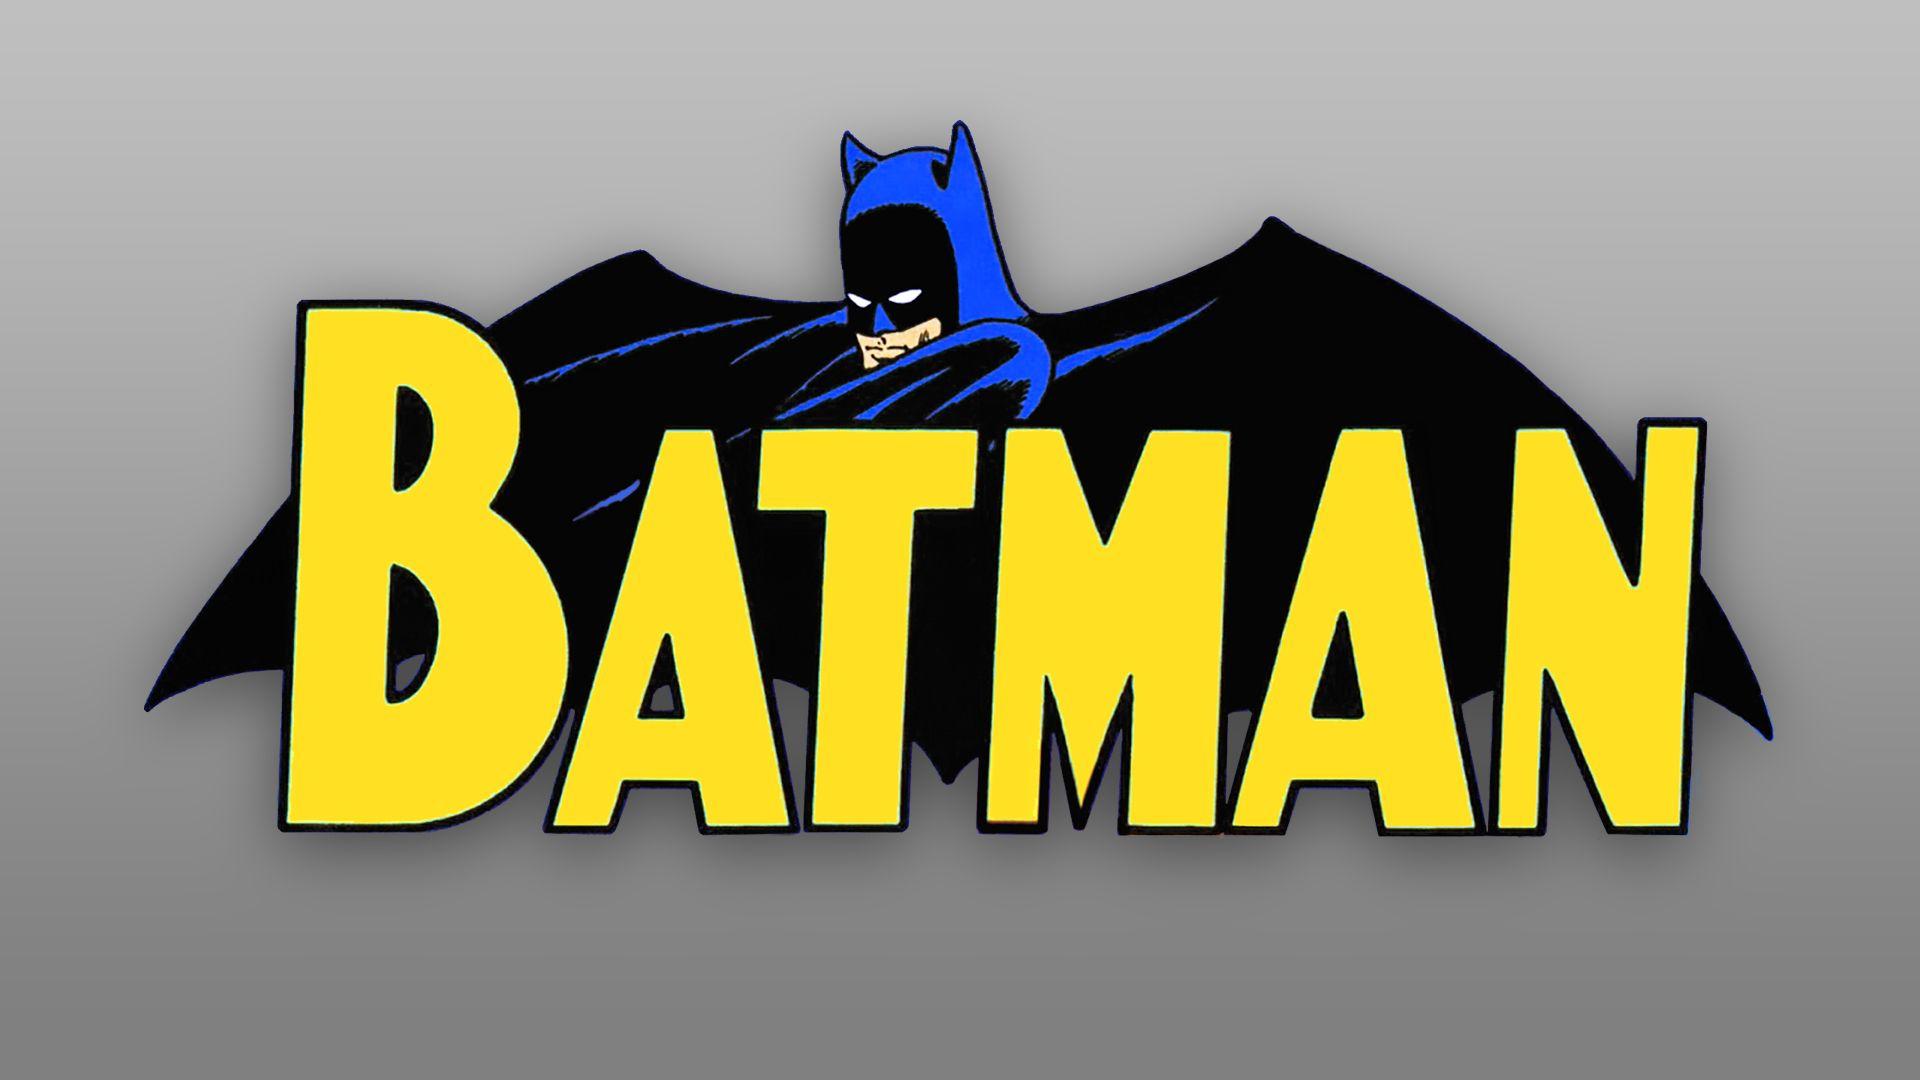 1960s Batman Logo (1920x1080) Need iPhone 6S Plus